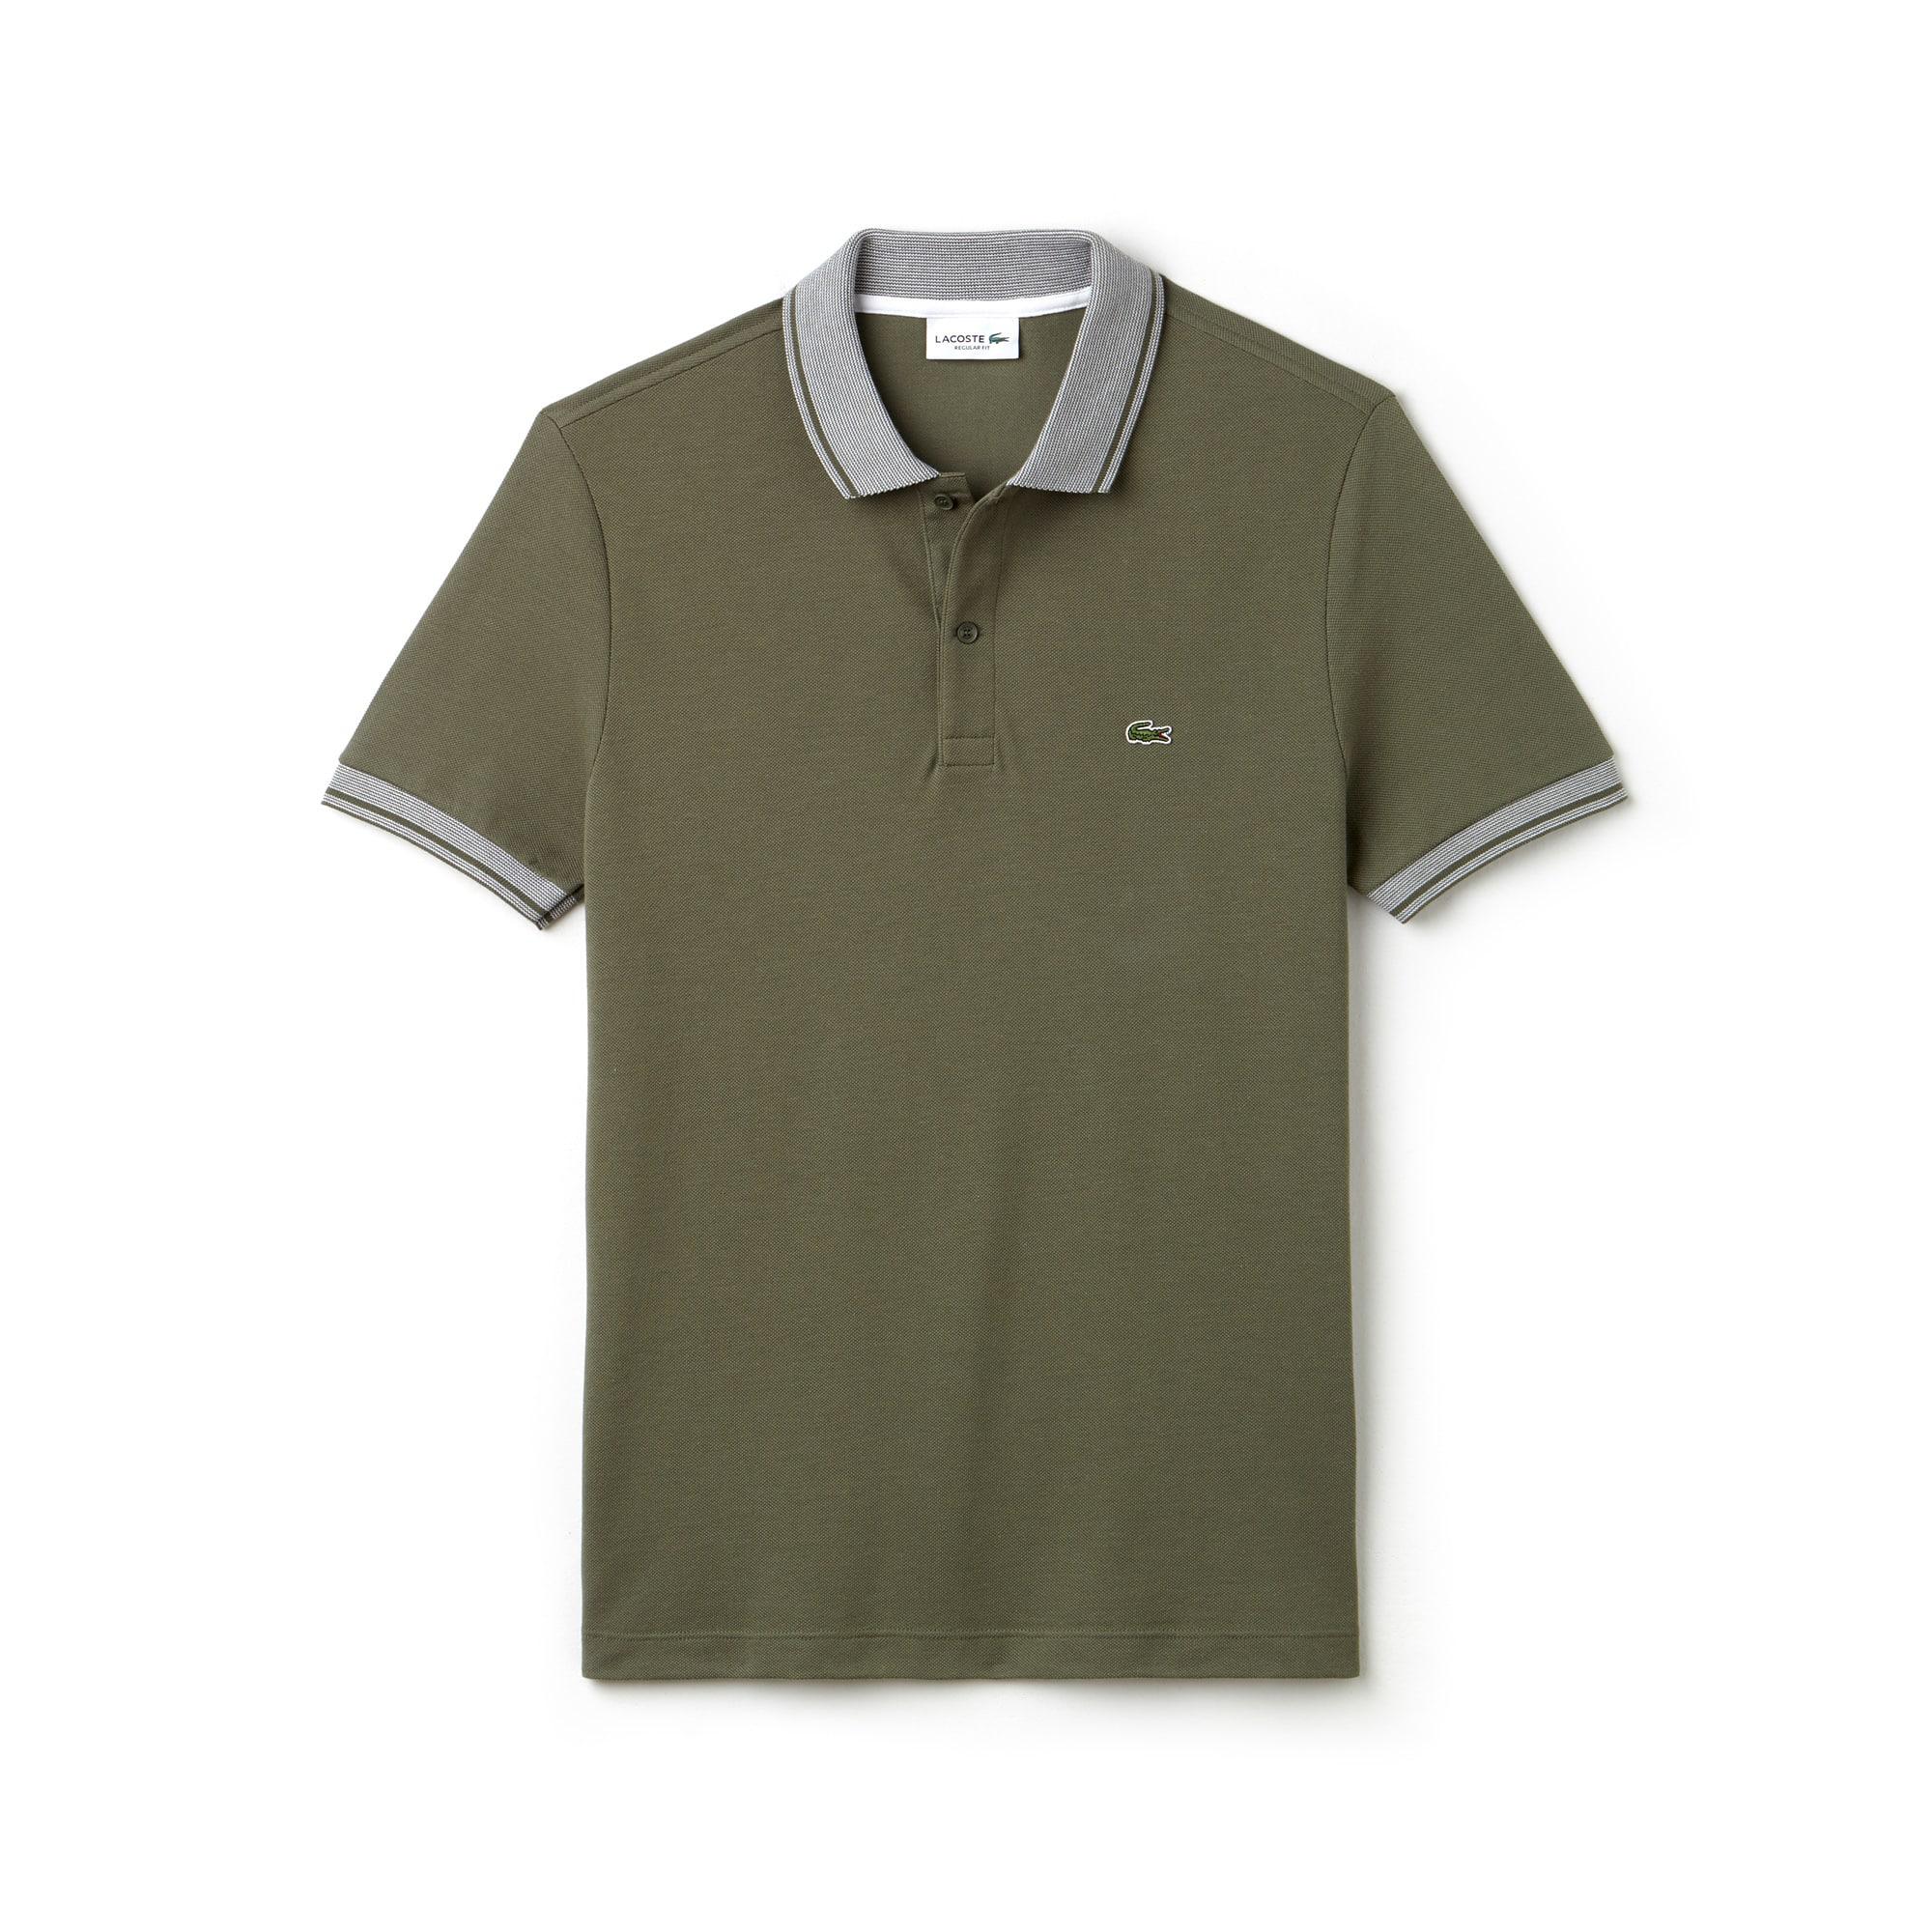 Regular Fit Herren-Polo aus Baumwoll-Petit-Piqué LACOSTE